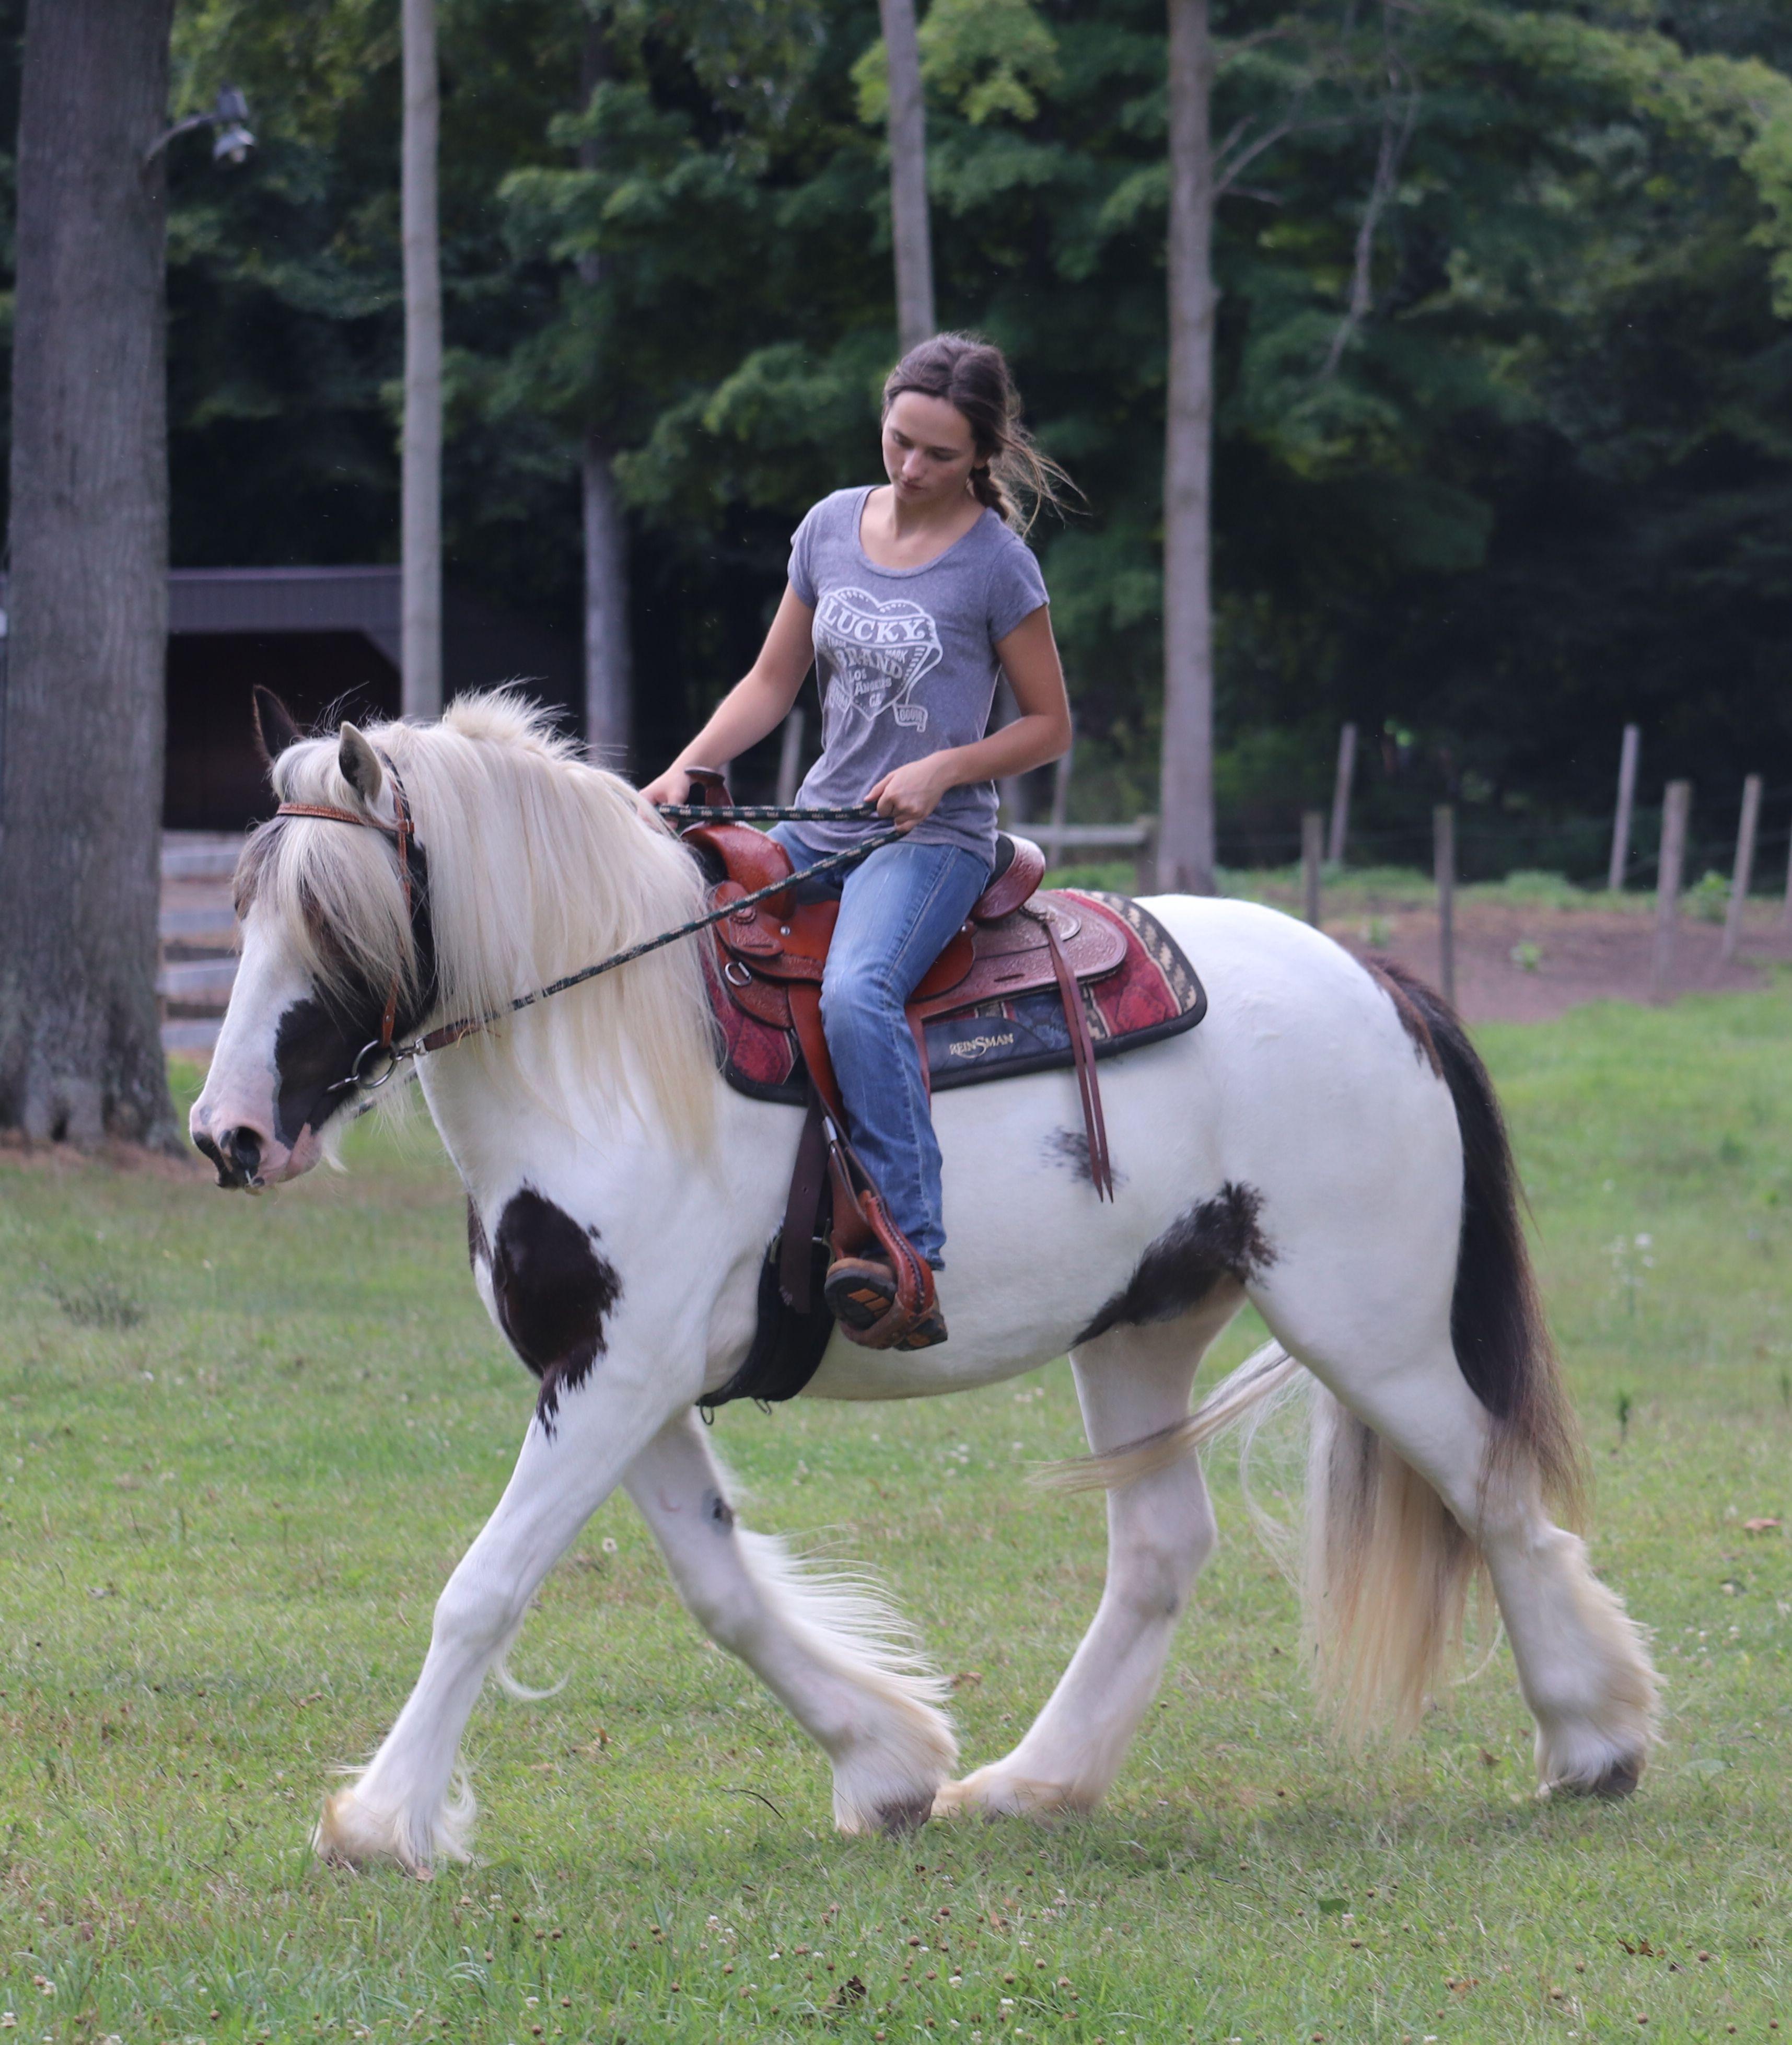 Western Riding Western Riding Riding